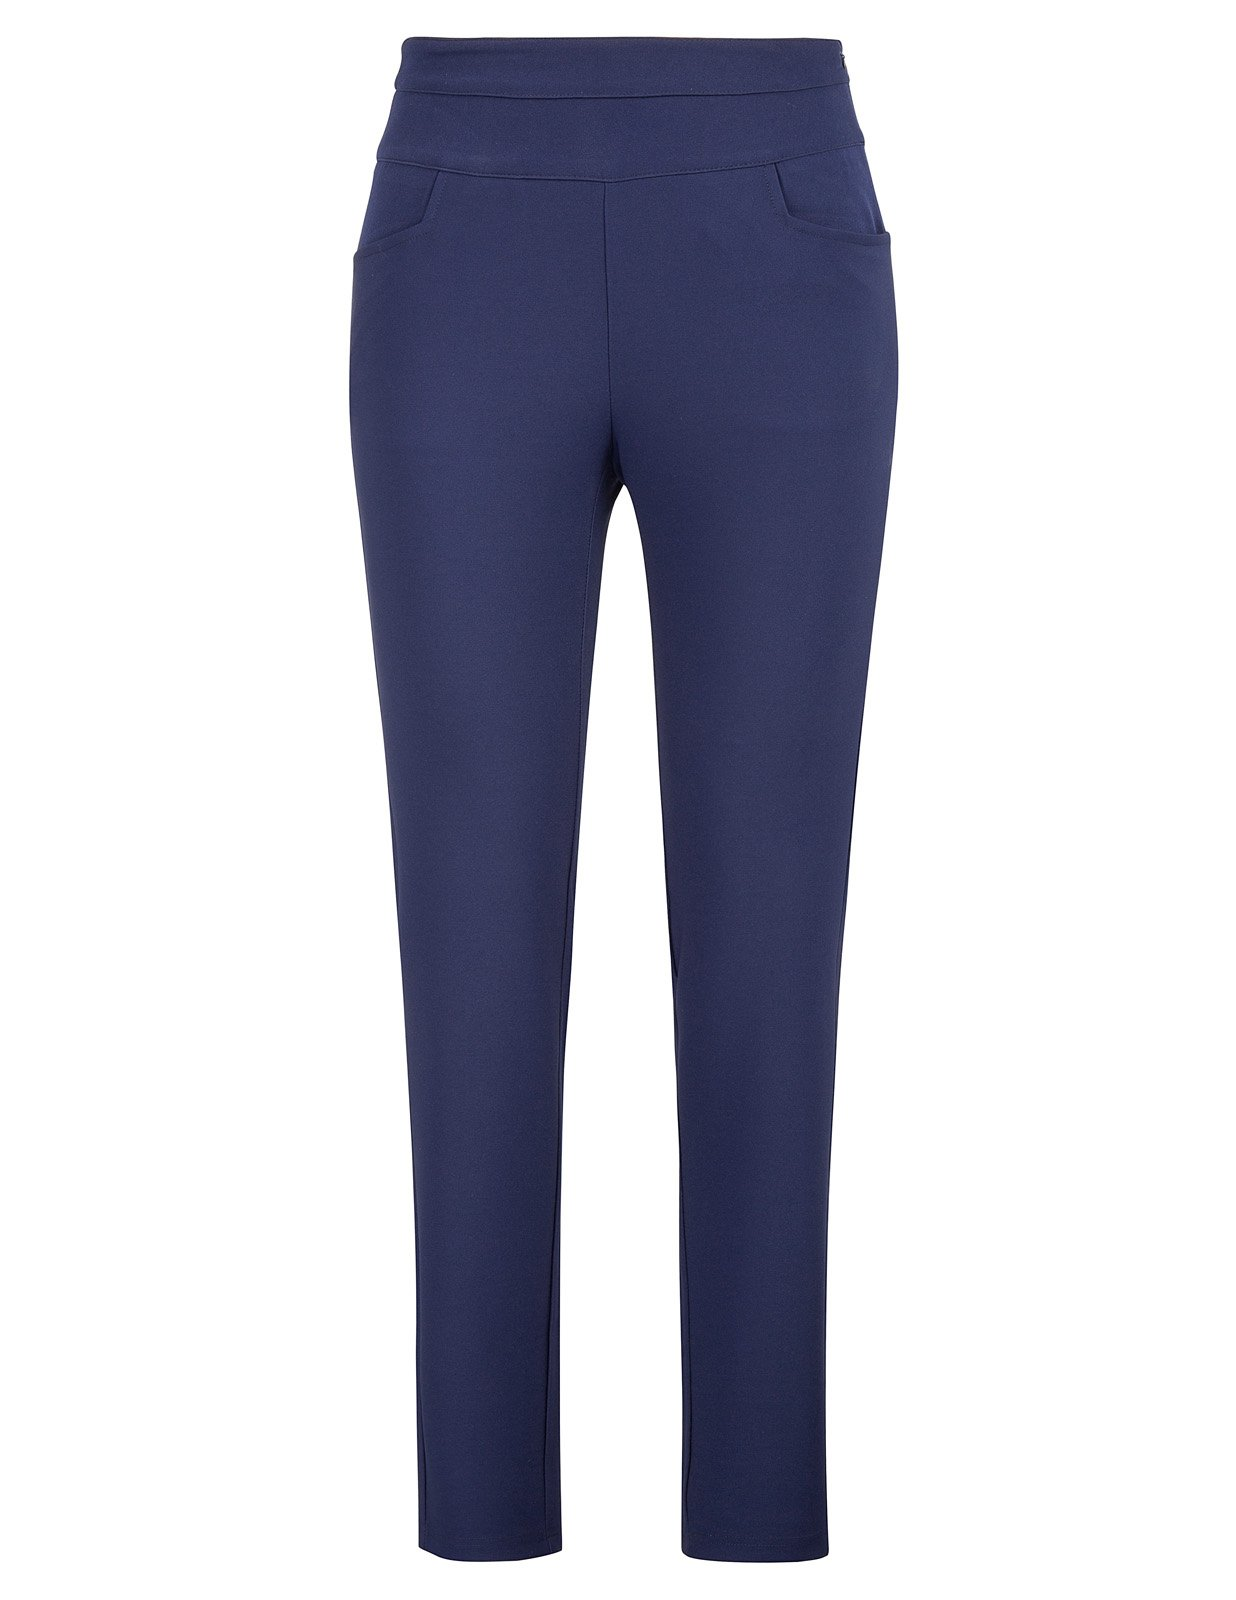 Kate Kasin Flat Front Pencil Pants with Pockets for Women Work Navy Blue L,KKAF1017-2